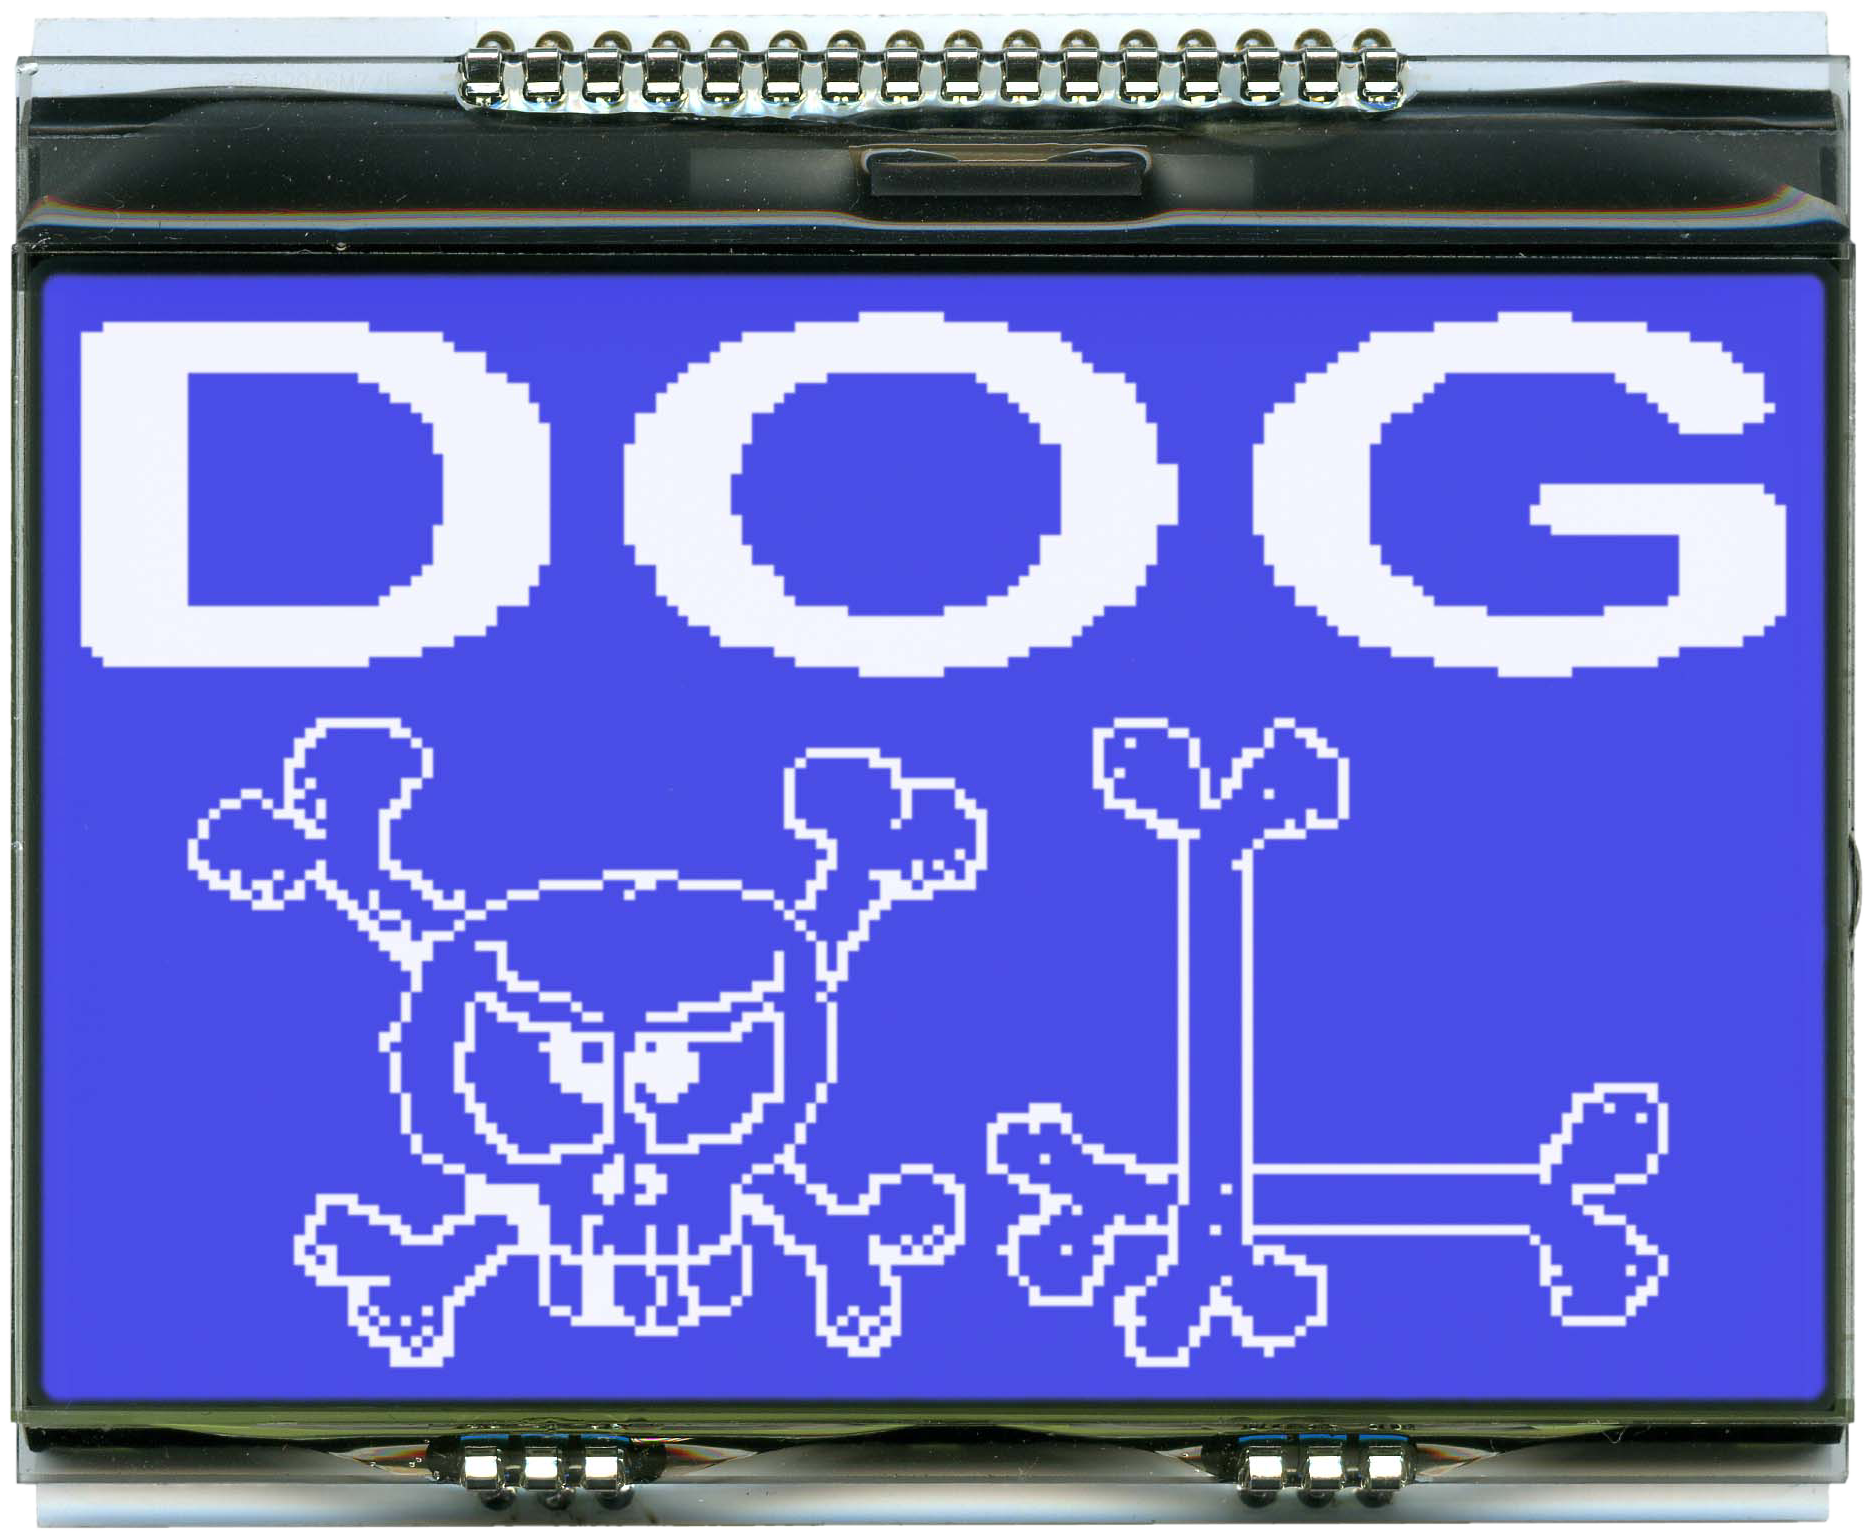 160x104 DOG Grafikdisplay, STN blau negativ